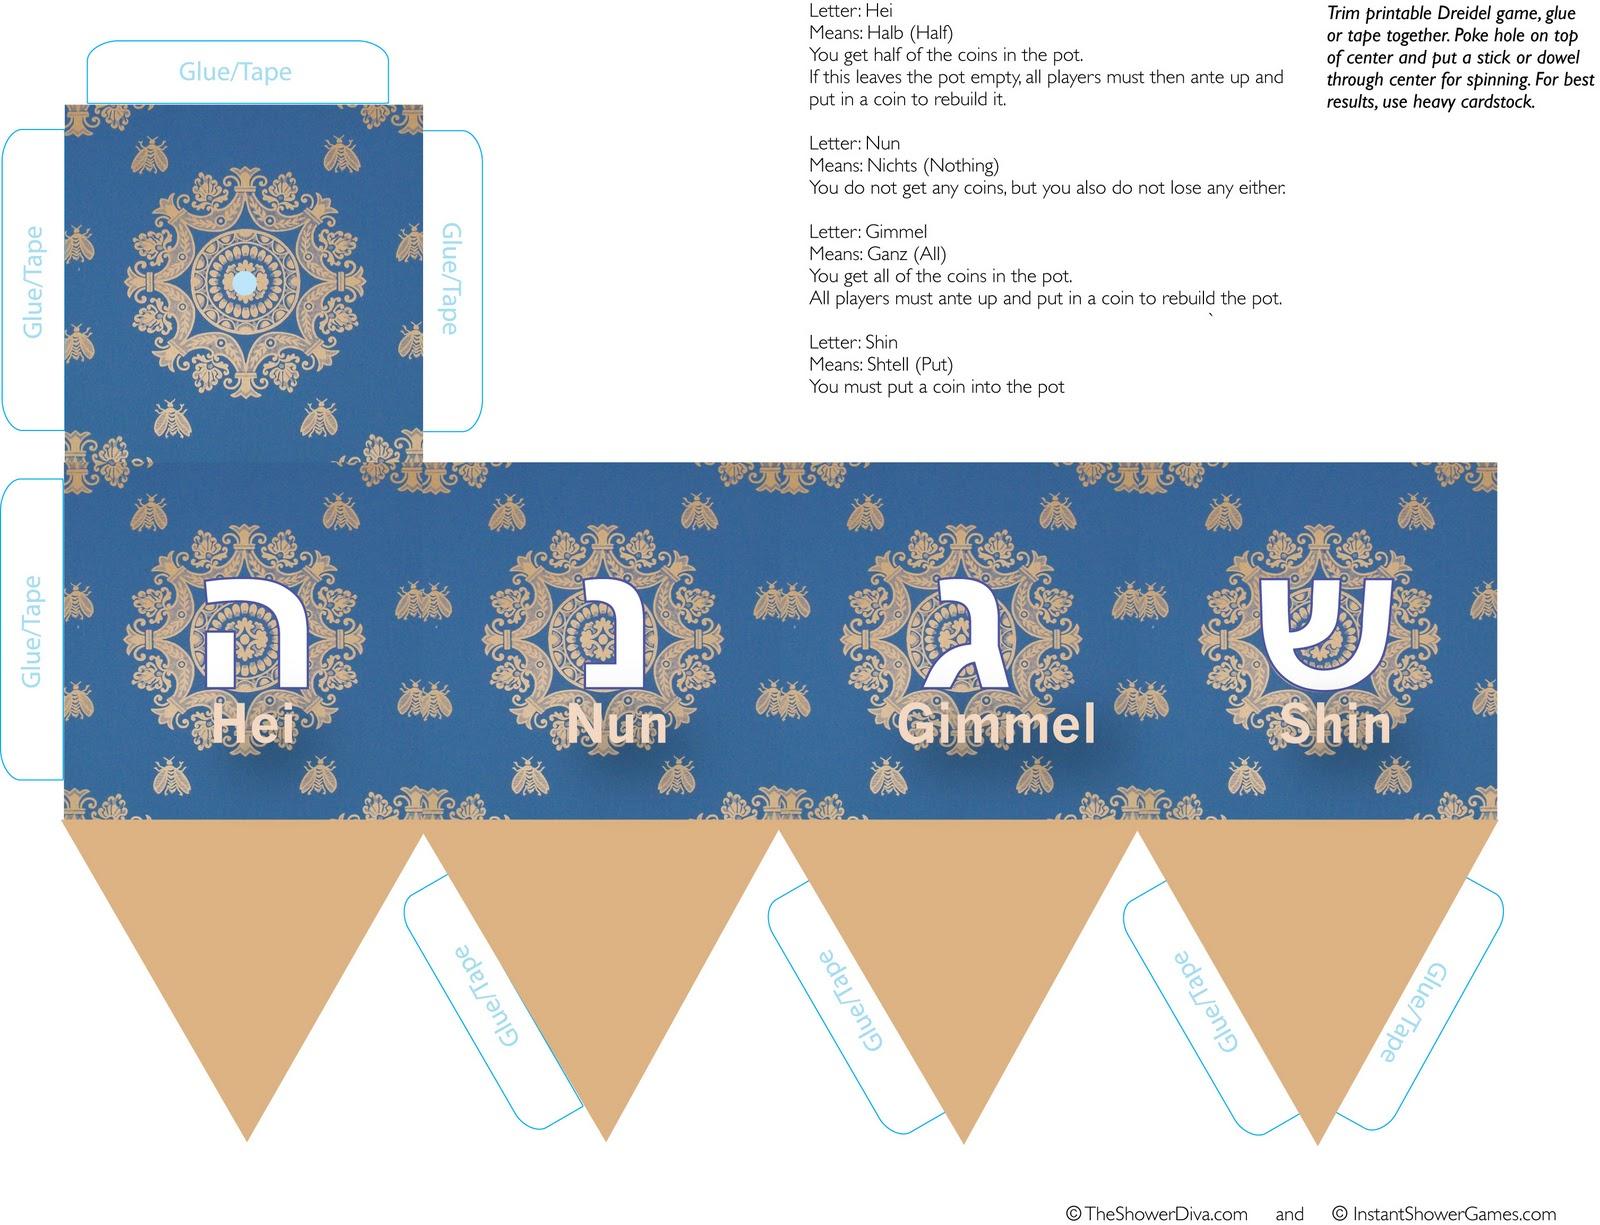 photo regarding Dreidel Printable referred to as Totally free Printable Dreidel Practice for Dreidel Paper Video game The